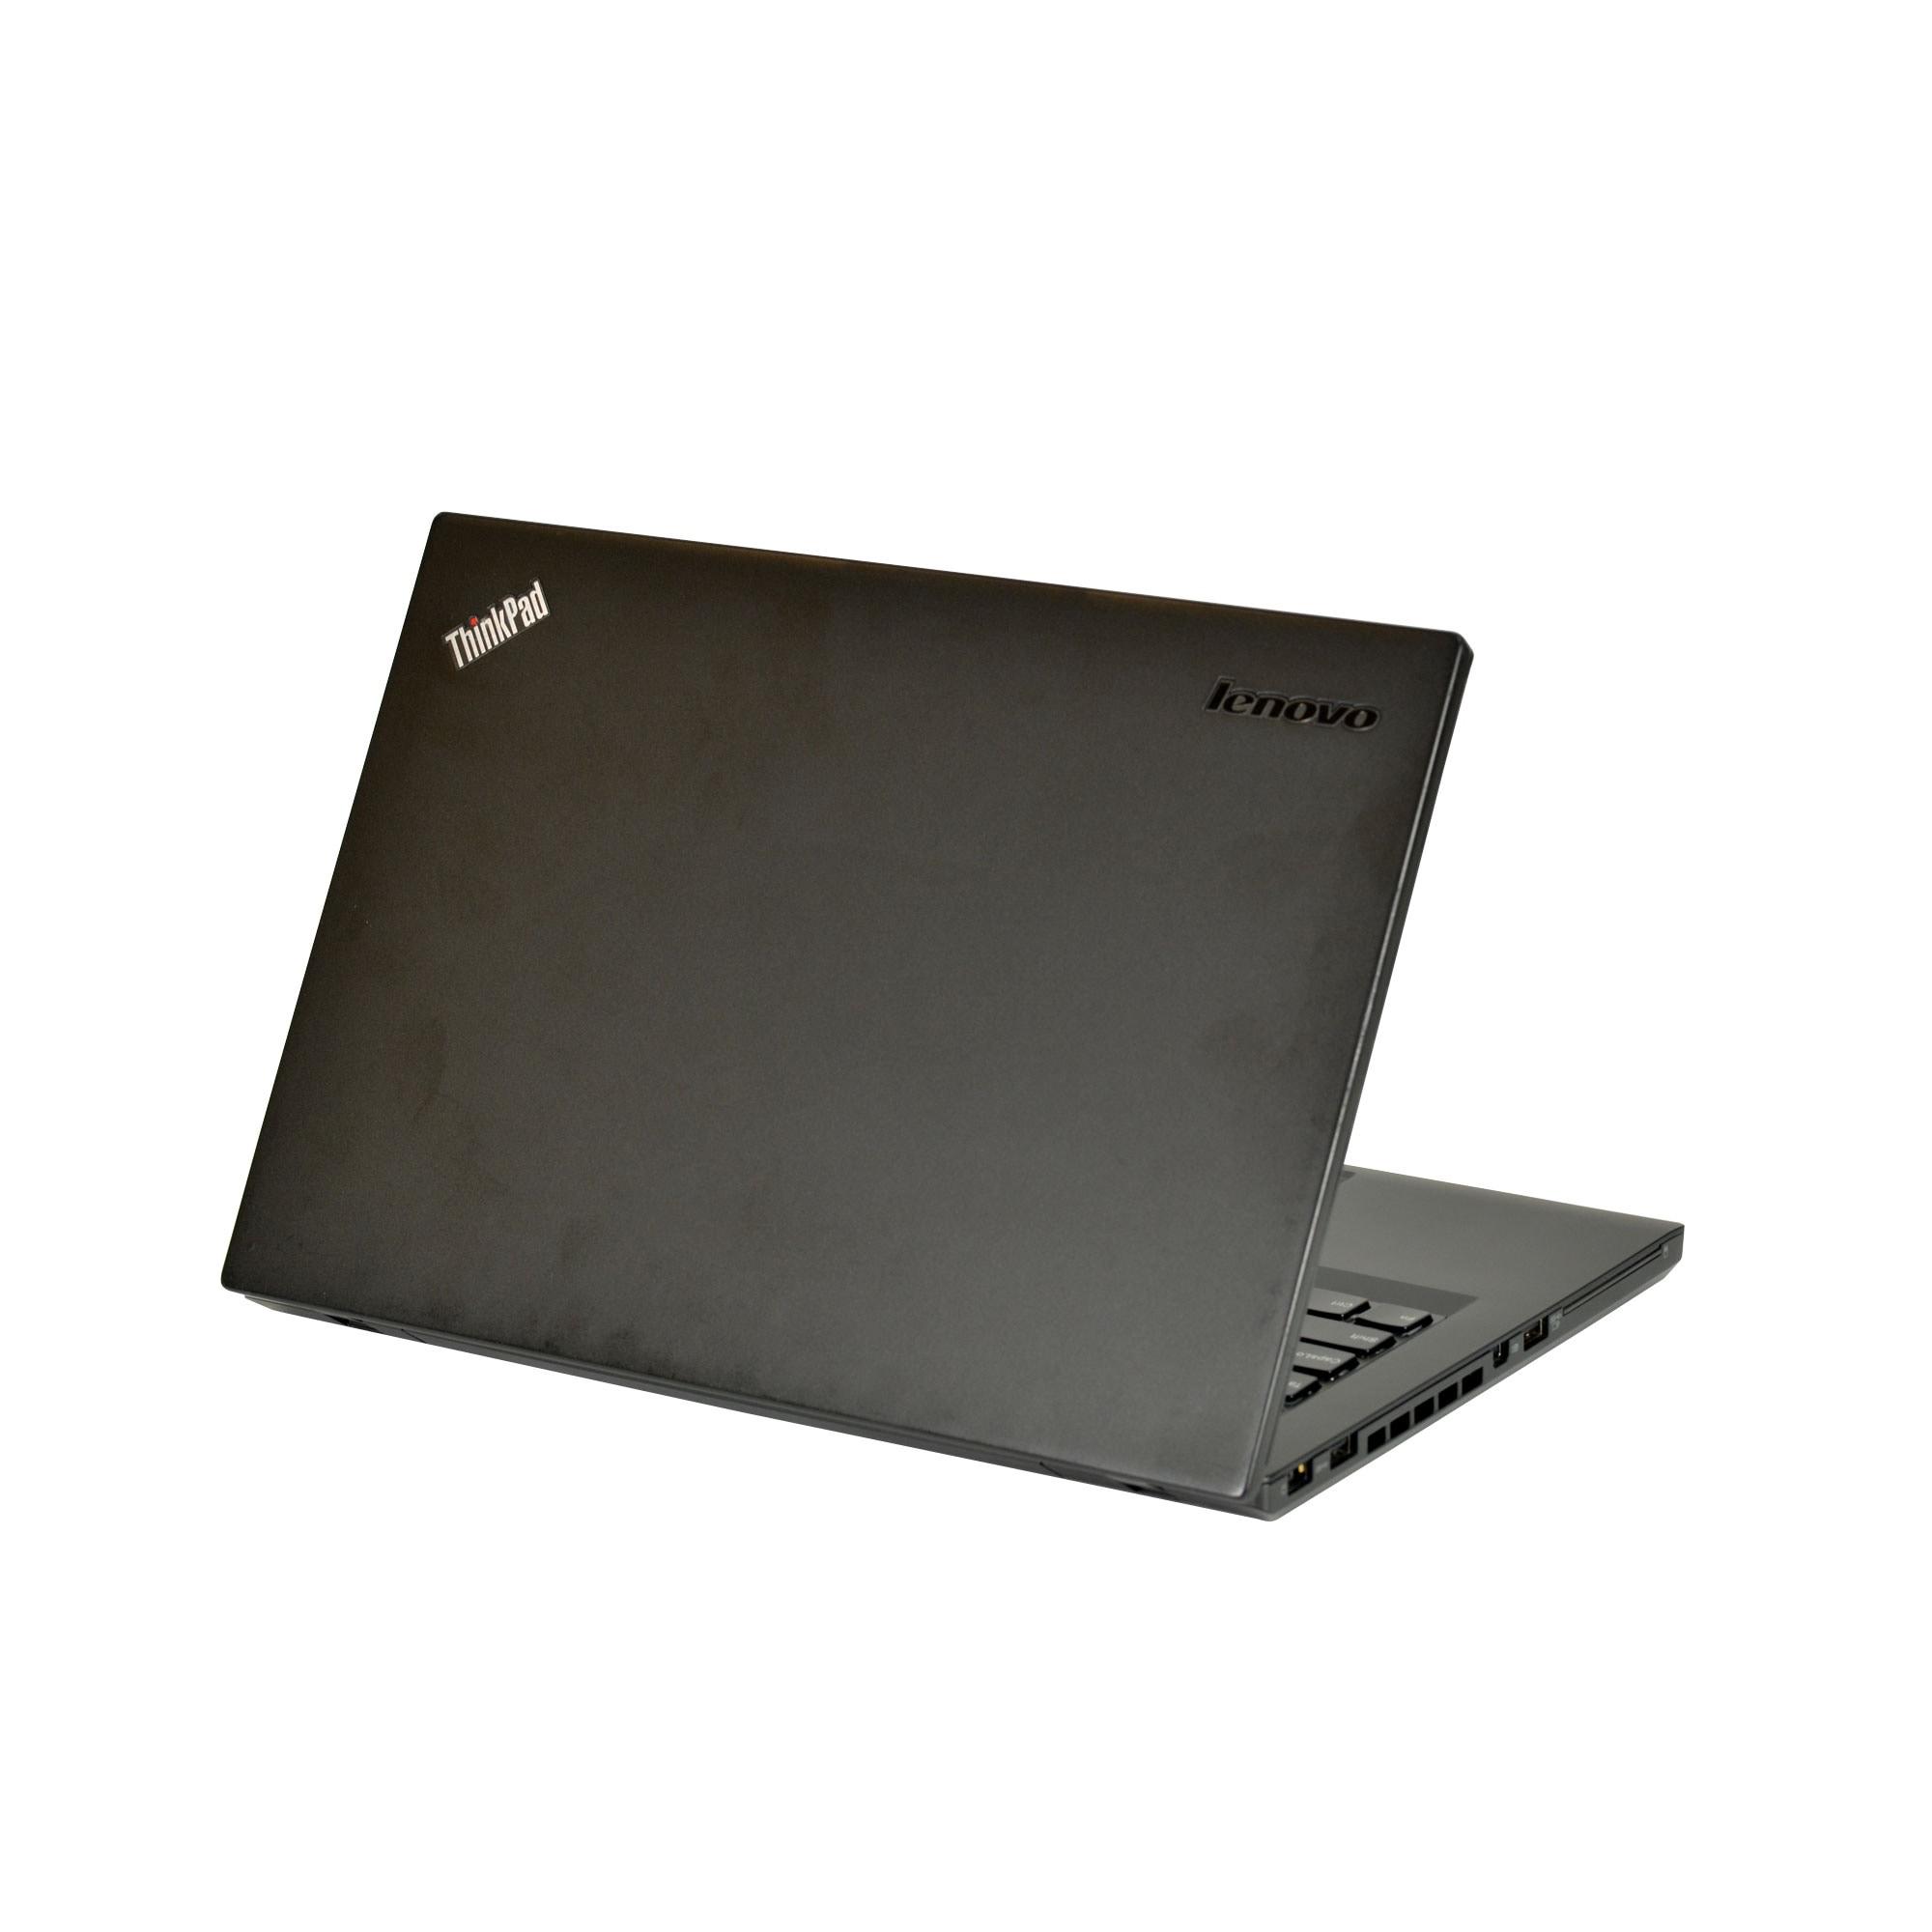 Lenovo Thinkpad T440s 4th Gen Core I7 4600u 2 1ghz 12gb Ram 256gb Ssd Win 10 Pro 14 Inch Laptop Refurbished